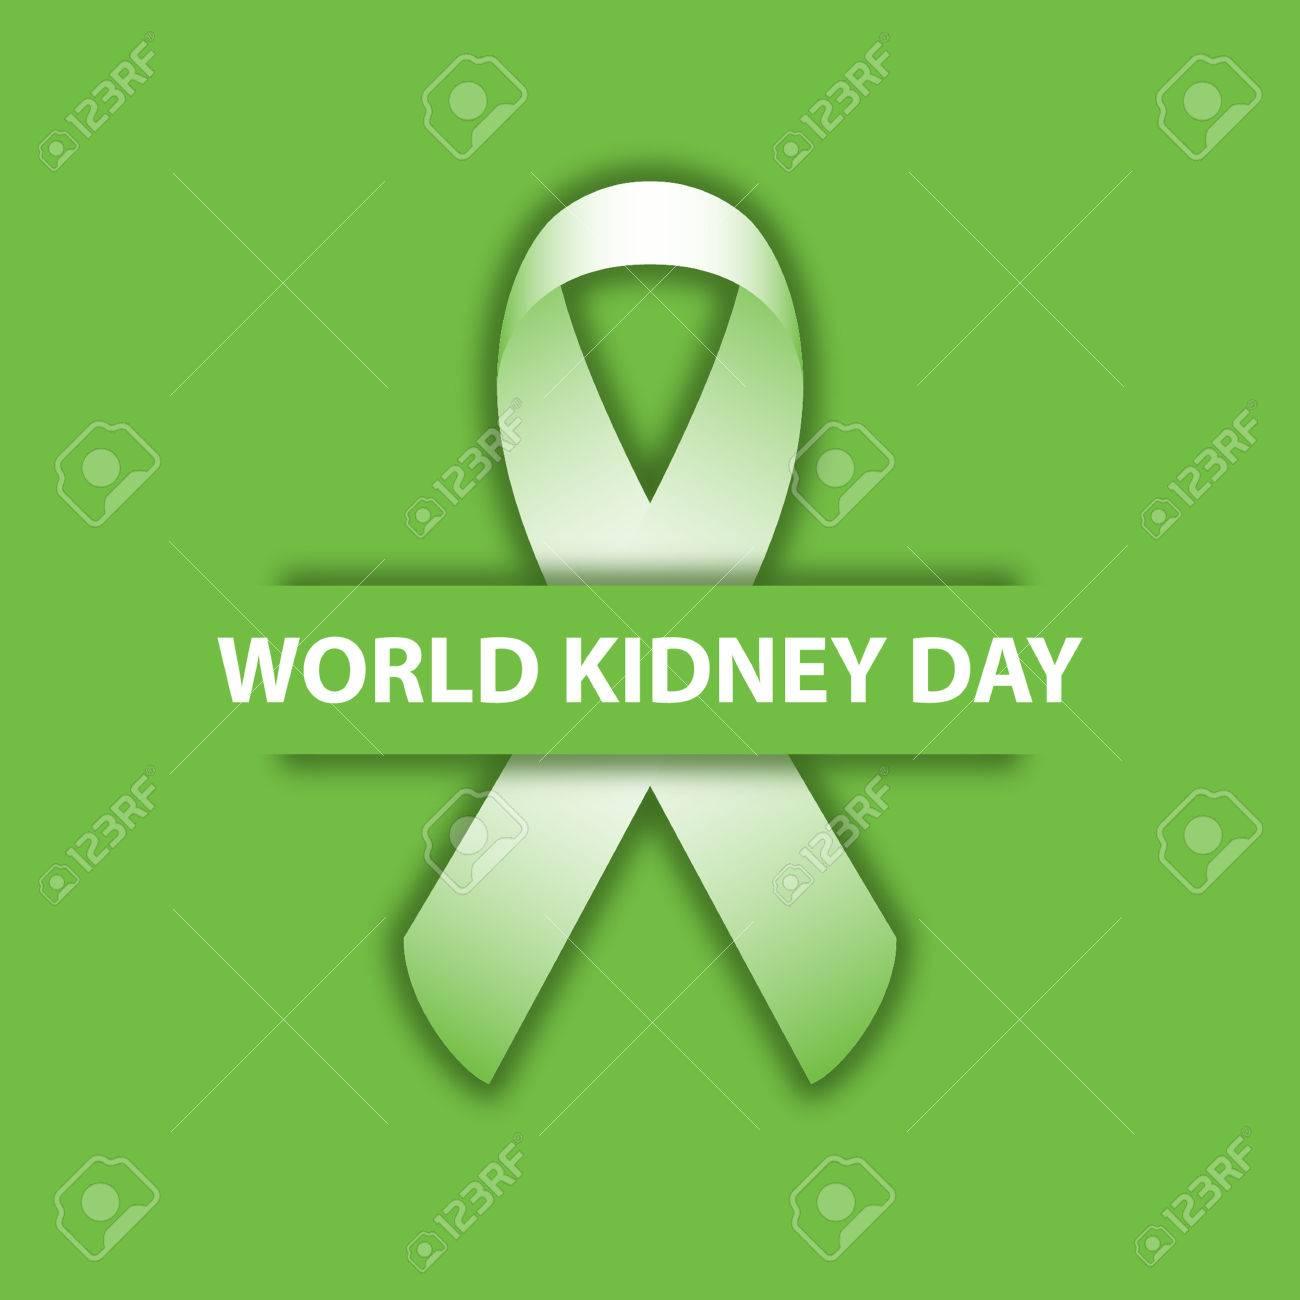 world kidney day green ribbon design illustration 05 royalty free